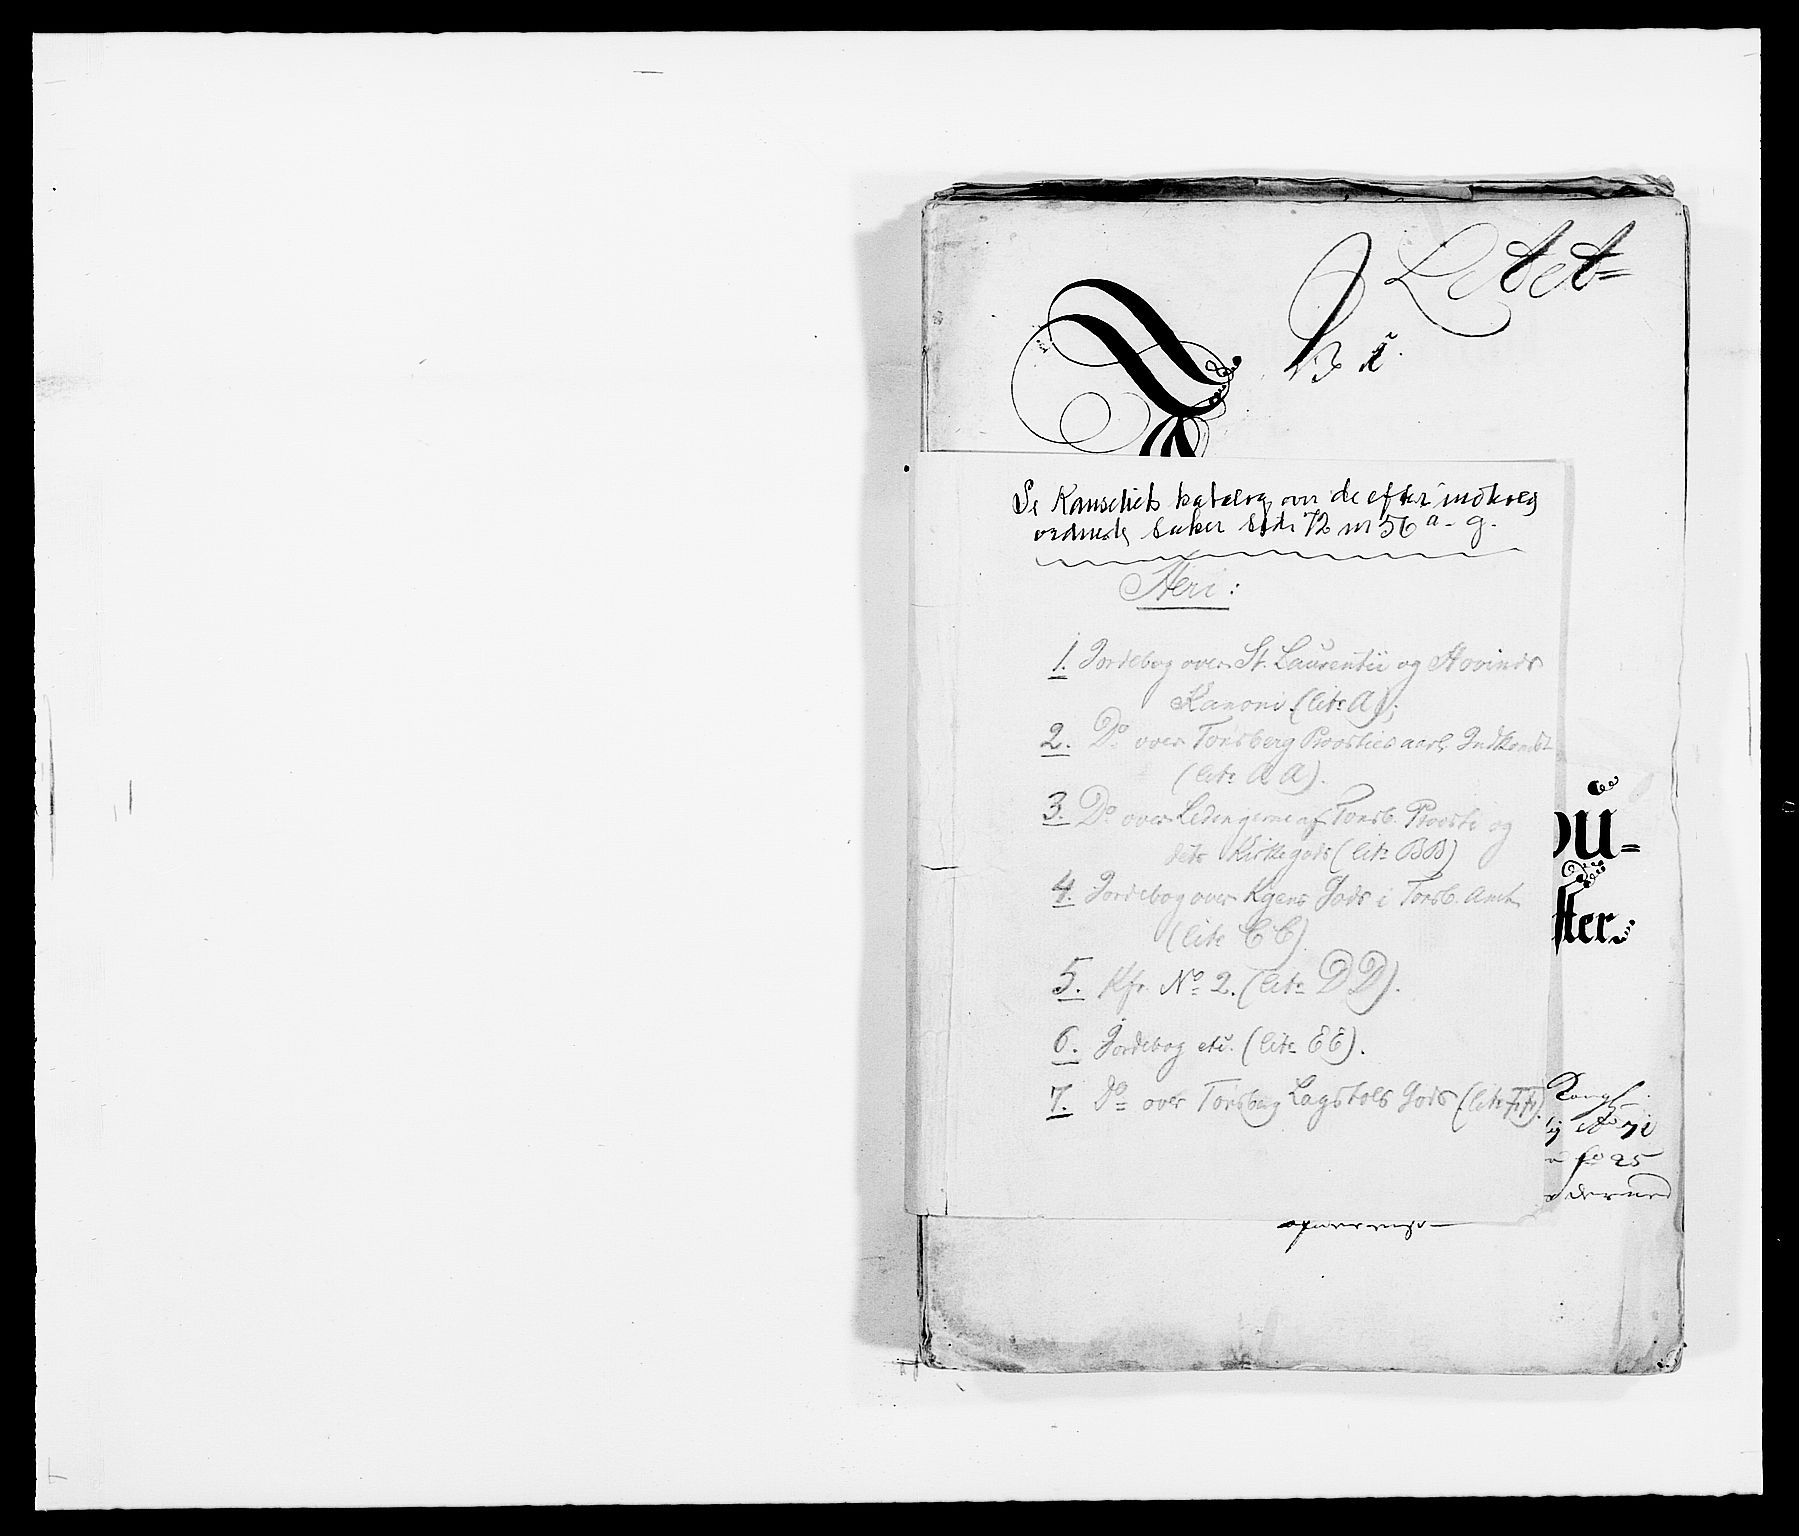 RA, Rentekammeret inntil 1814, Reviderte regnskaper, Fogderegnskap, R32/L1845: Fogderegnskap Jarlsberg grevskap, 1676-1678, s. 79